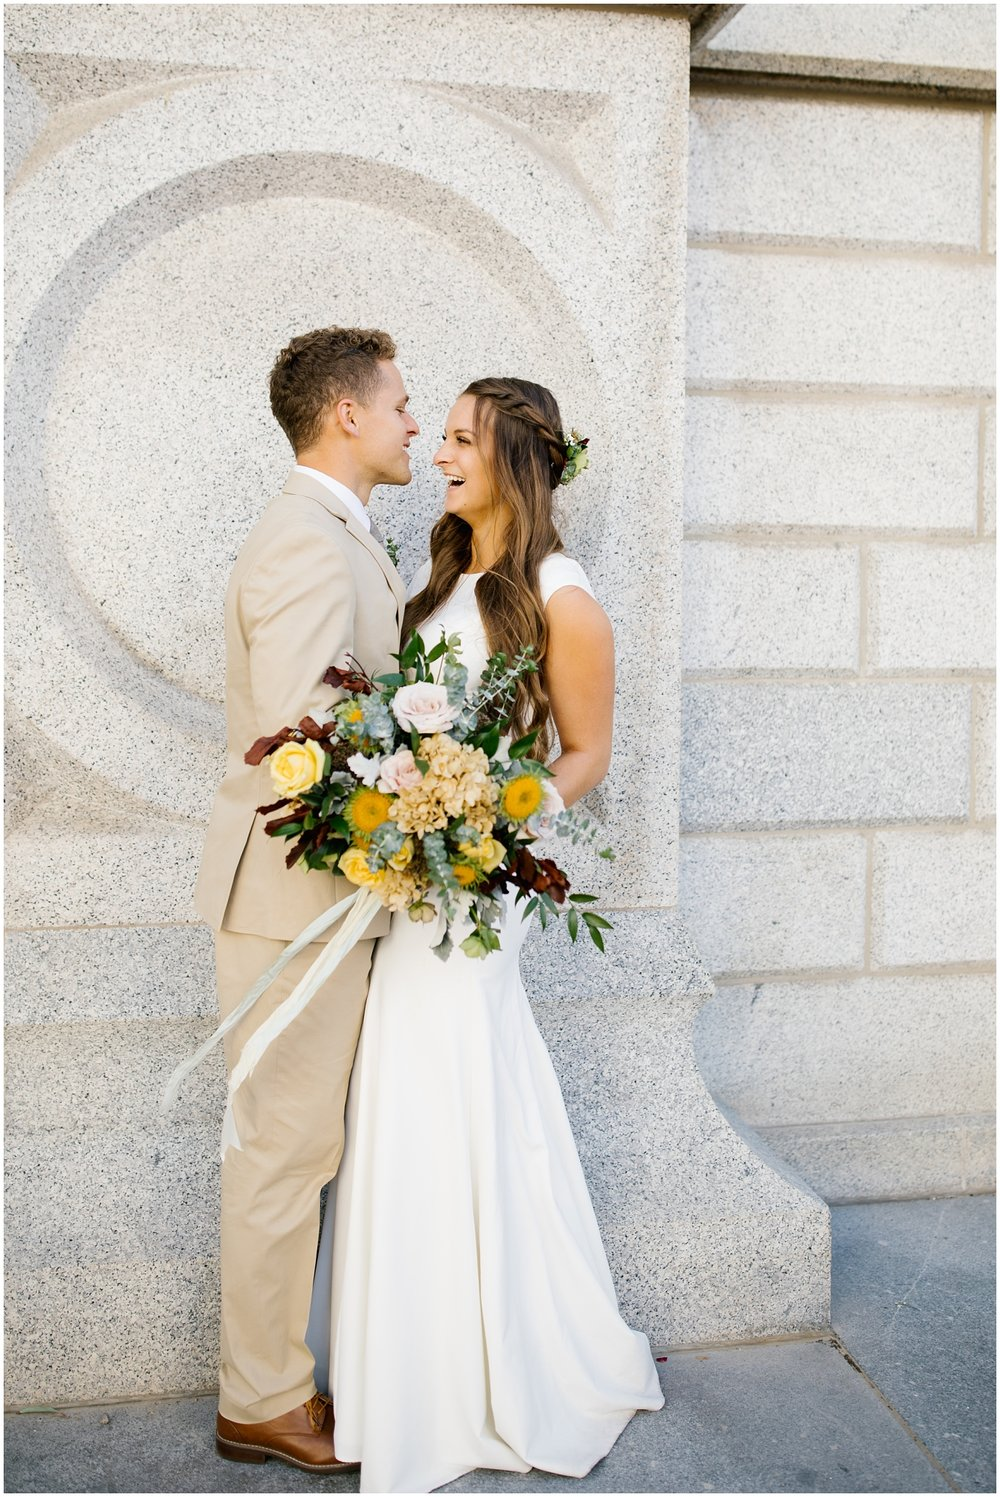 JC-Wedding-181_Lizzie-B-Imagery-Utah-Wedding-Photographer-Park-City-Salt-Lake-City-Temple-Joseph-Smith-Memorial-Building-Empire-Room.jpg